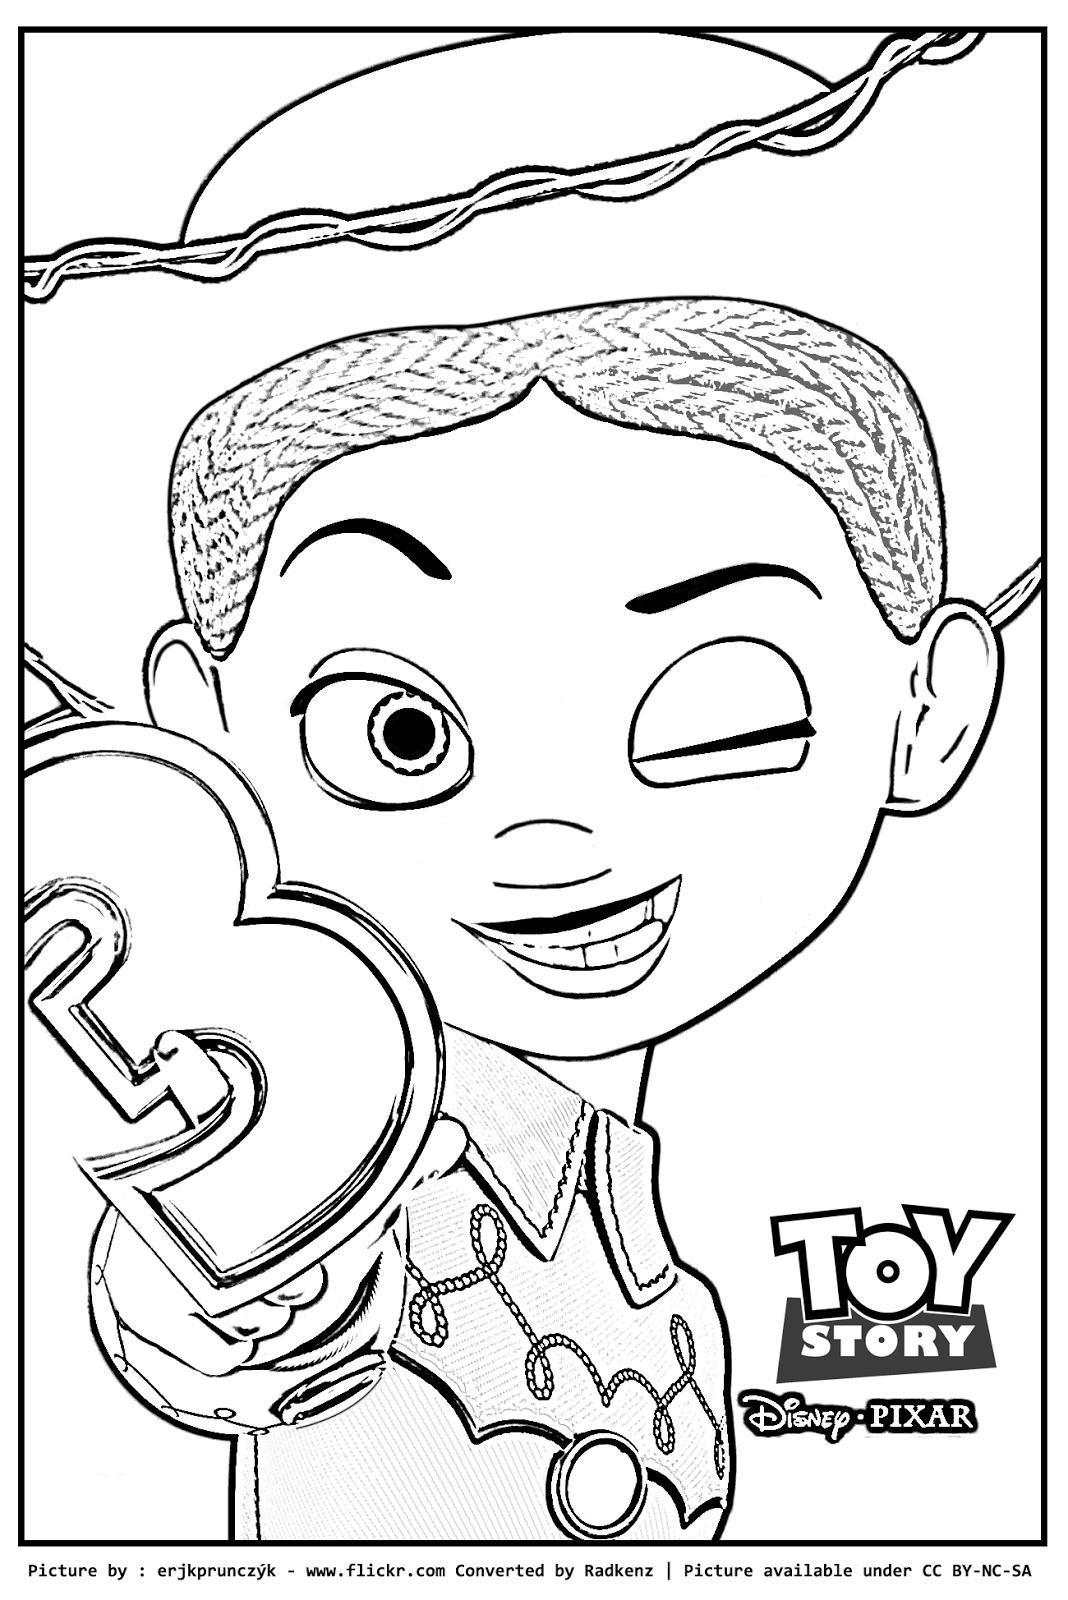 jessie coloring page radkenz artworks gallery toy story jessie coloring page page coloring jessie